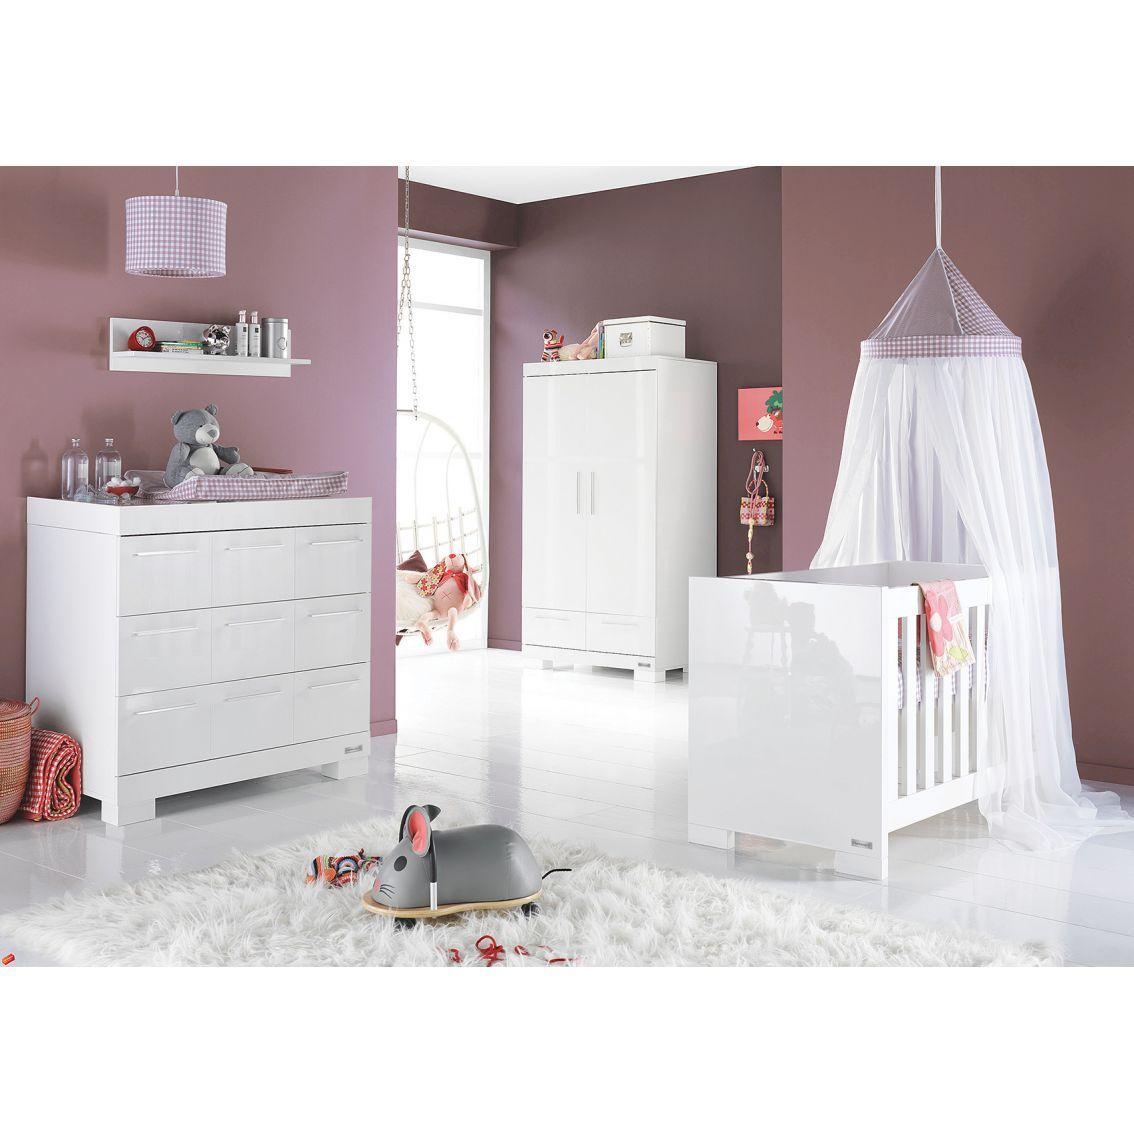 stylish nursery furniture. BabyStyle Aspen 4 Piece Room Set Contemporary, Ultra-Modern Nursery Furniture This Super- Stylish R